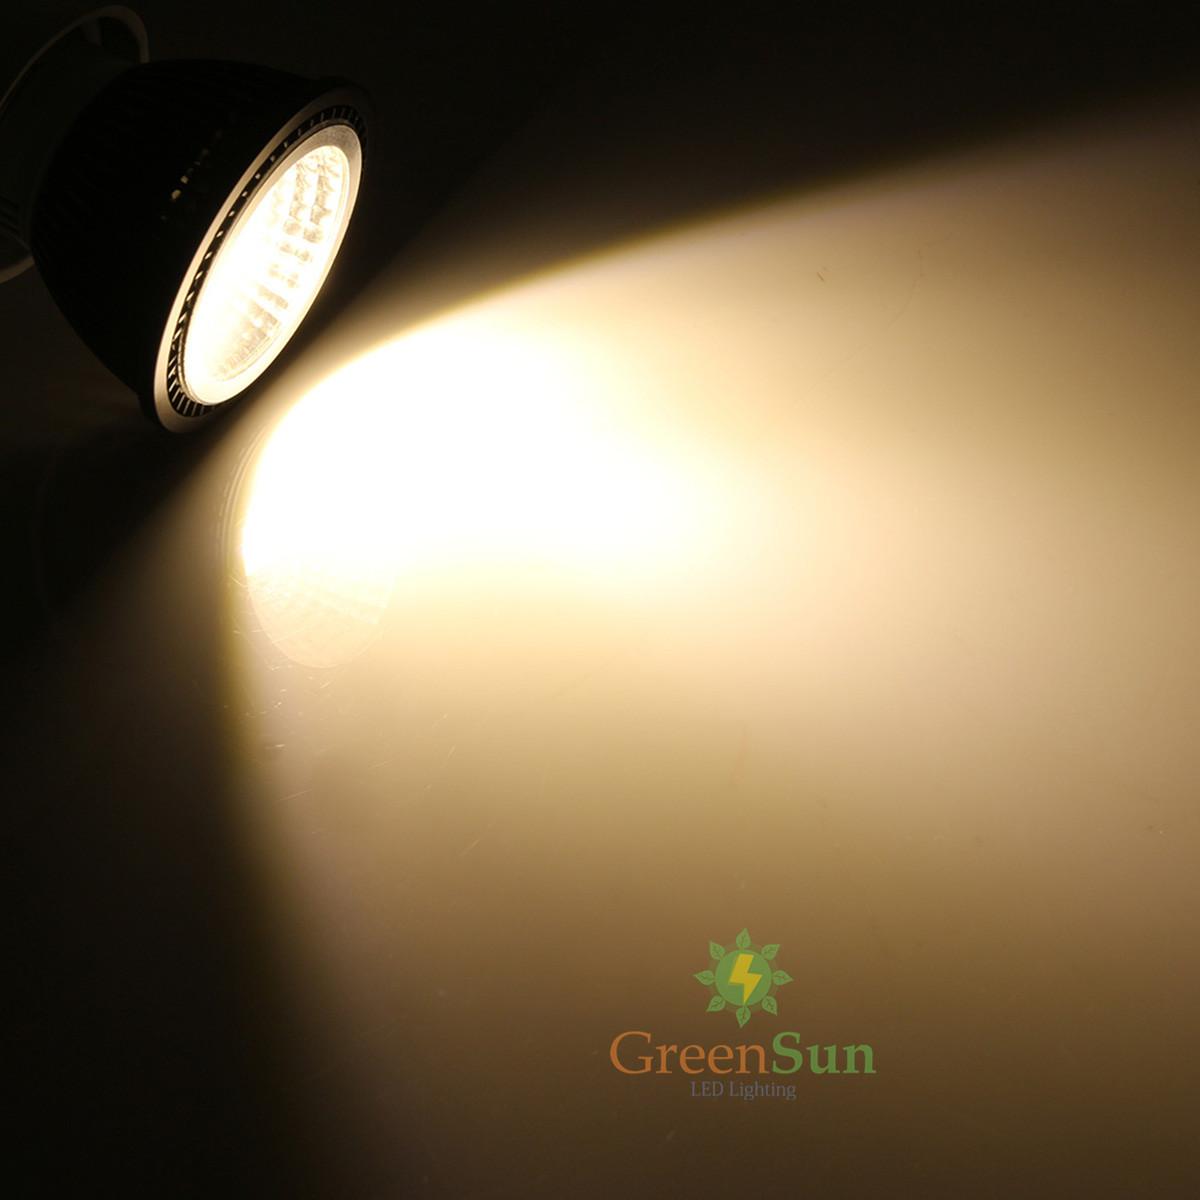 e14 gu10 e27 cob led reflektor strahler licht lampe birne spot leuchtmittel ebay. Black Bedroom Furniture Sets. Home Design Ideas